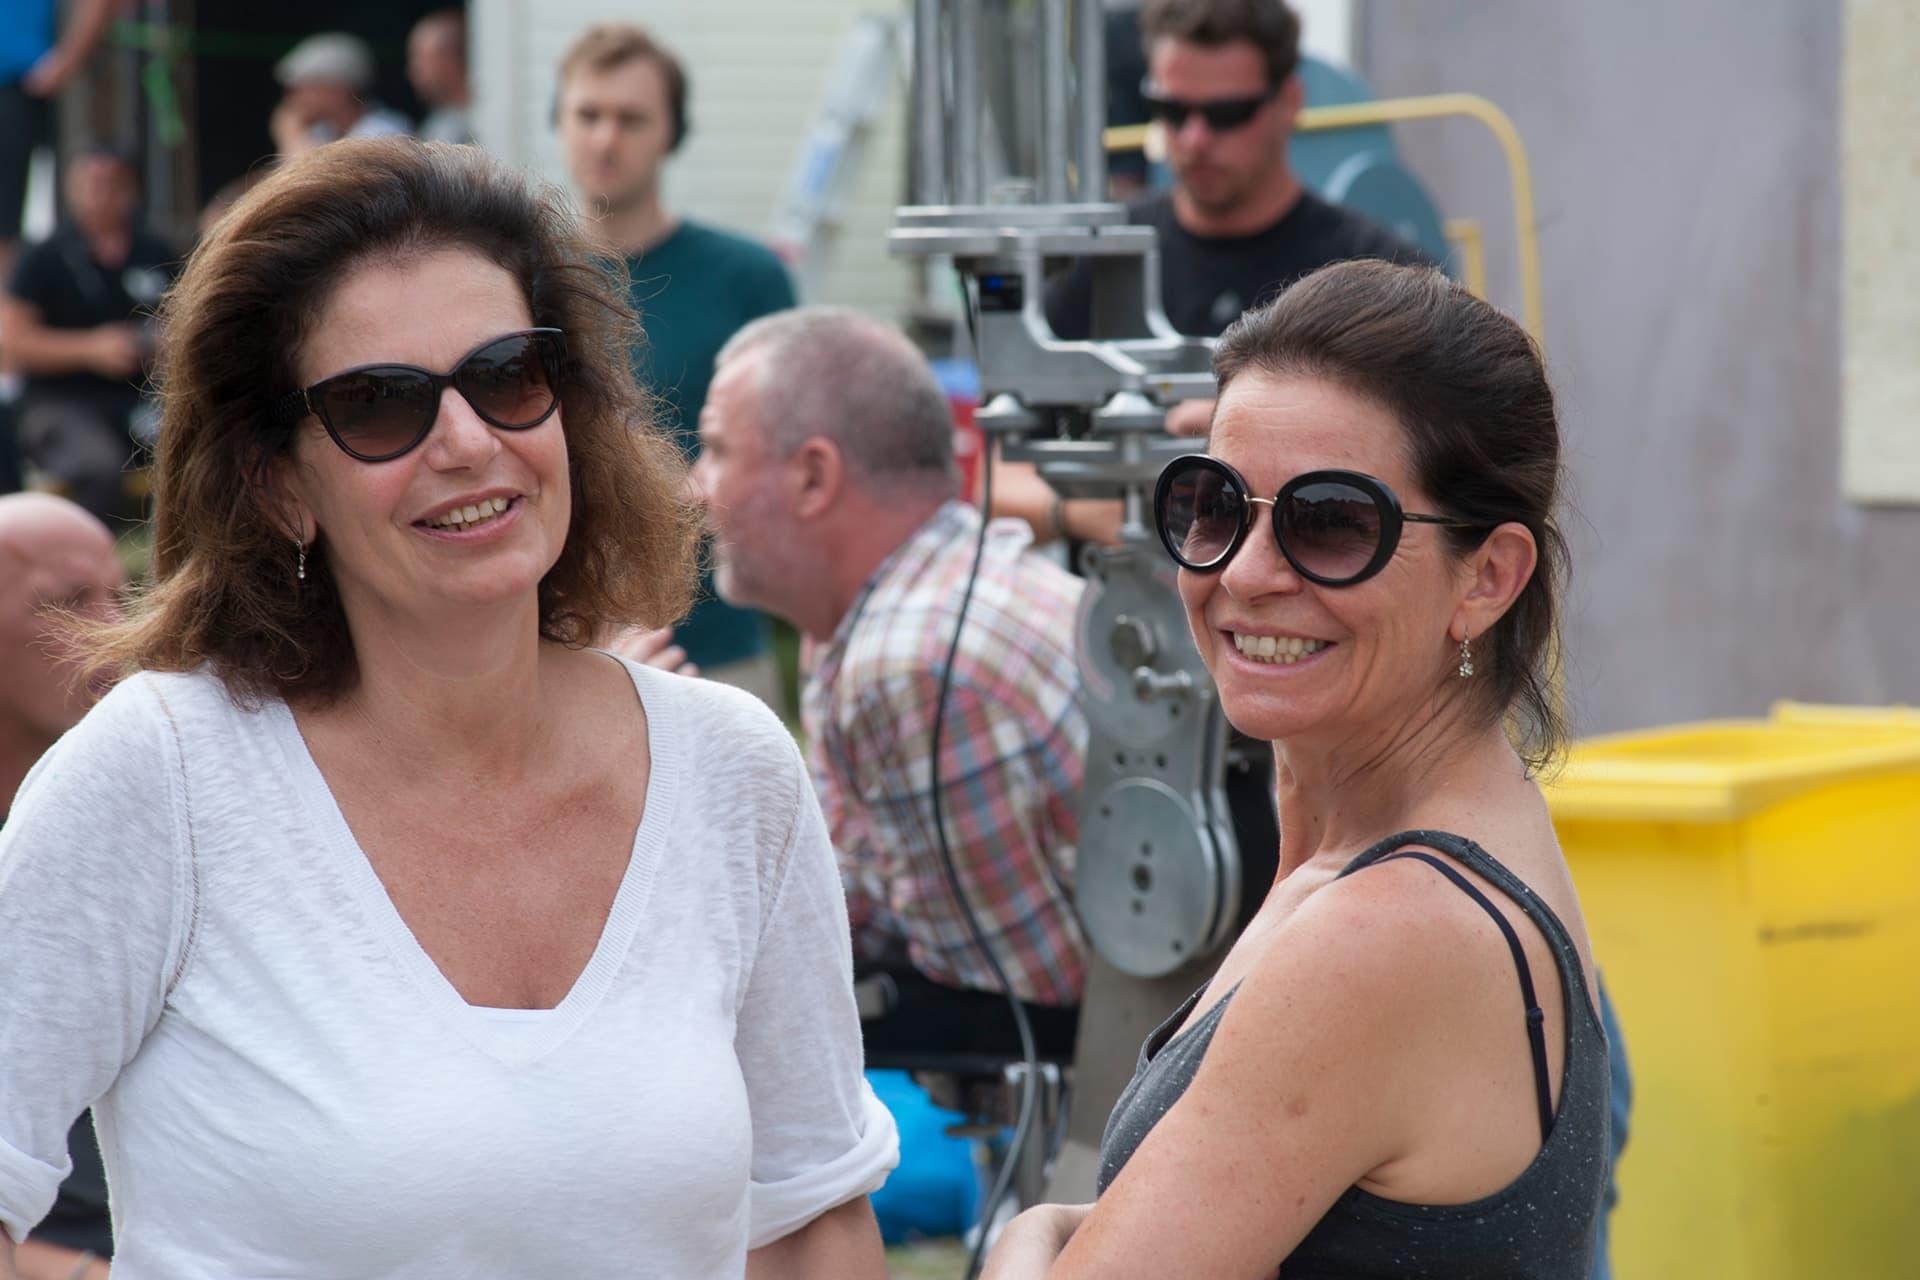 Co-producer Ildikó Kemény with Costume Designer Andrea Flesch on the set of X Company Season 3 in Budapest, Hungary.